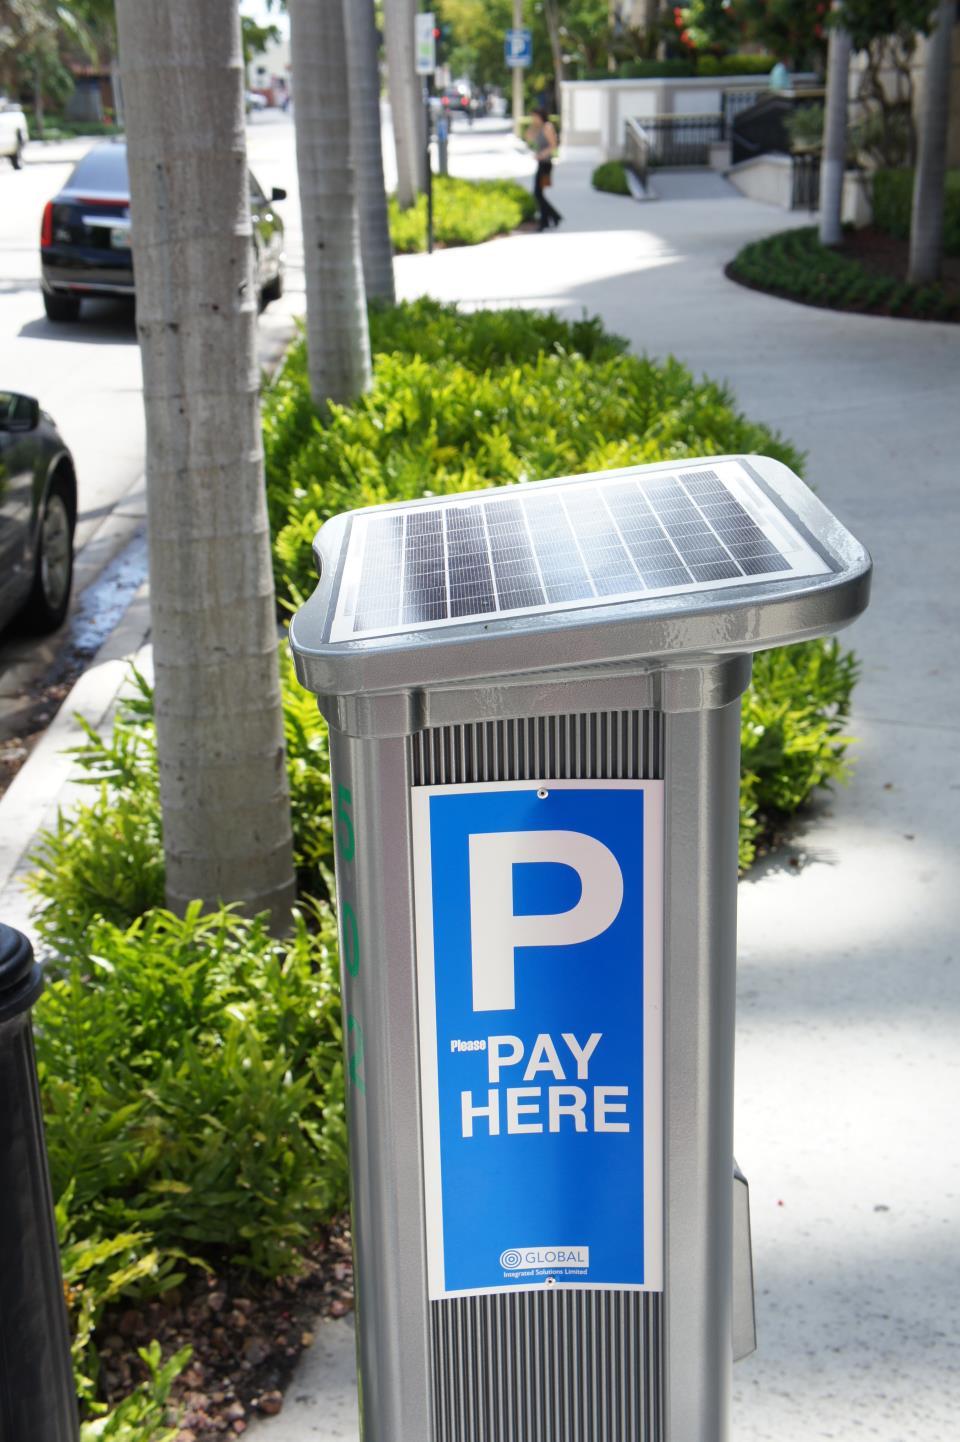 Solar Parking Meter Las Olas South side